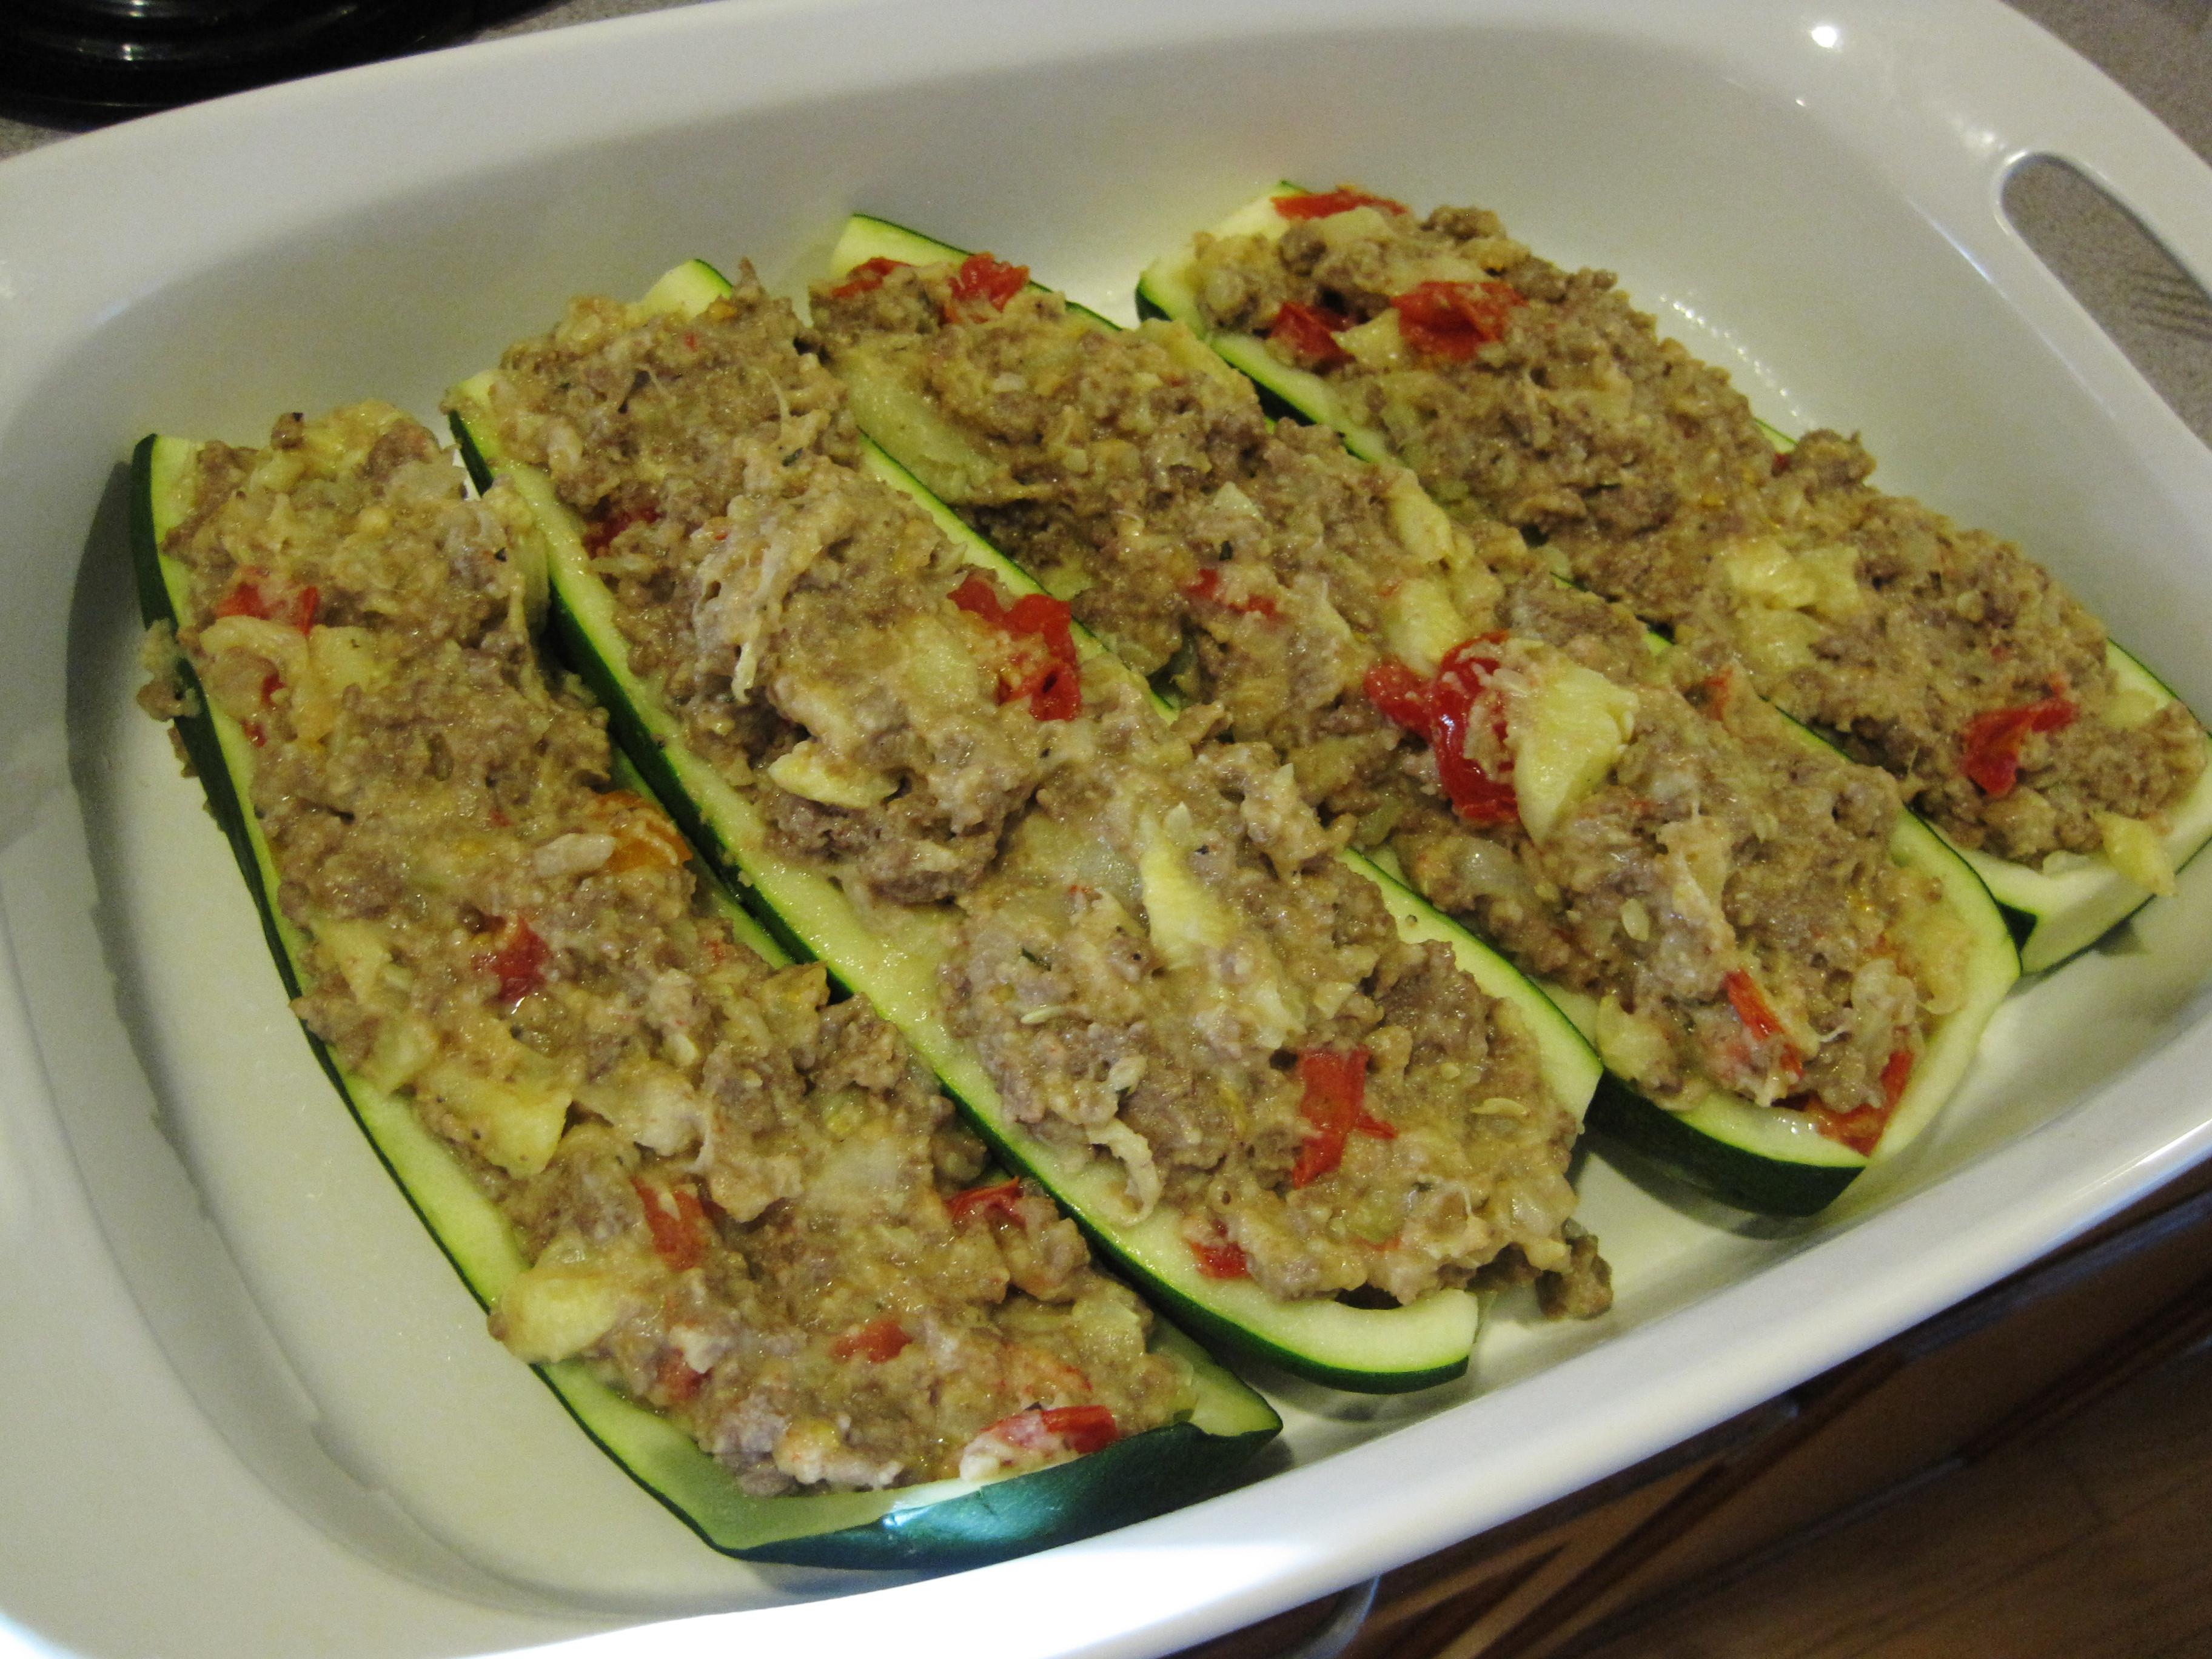 Stuffed Zucchini Ground Beef  Stuffed Zucchini Boats A Summer Garden Recipe Loving Here